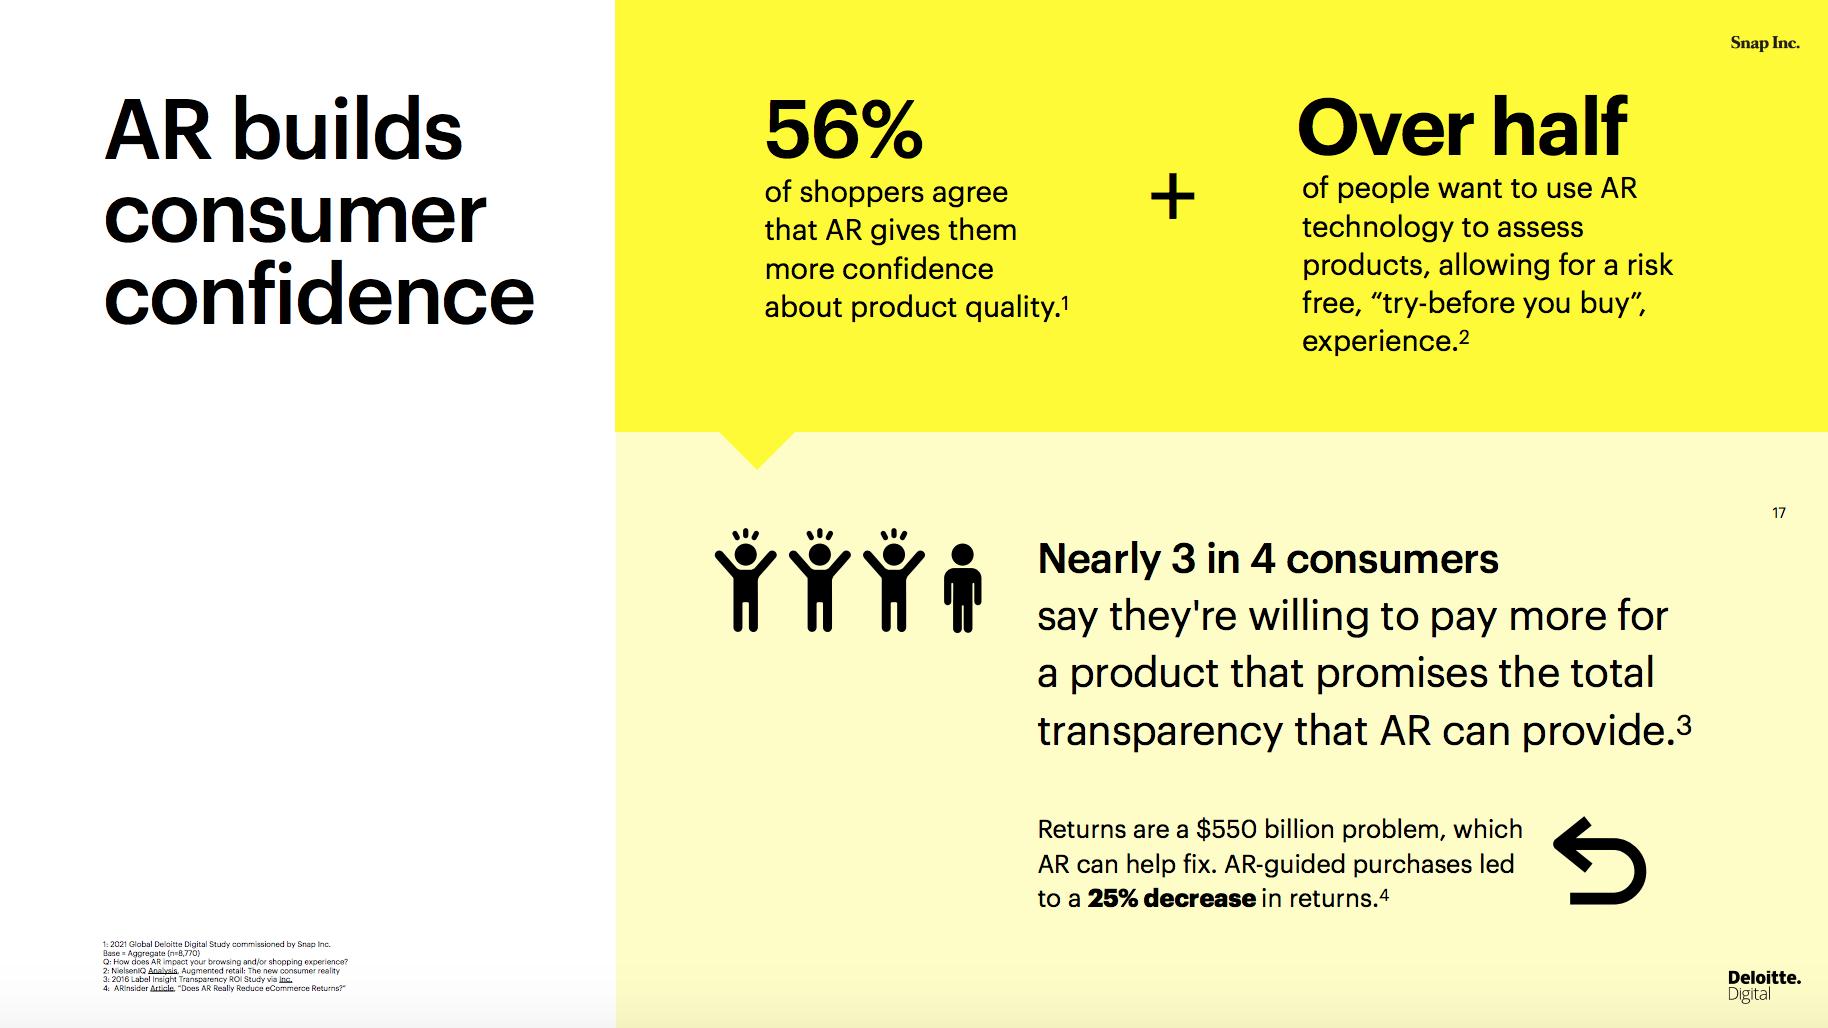 AR builds consumer confidence